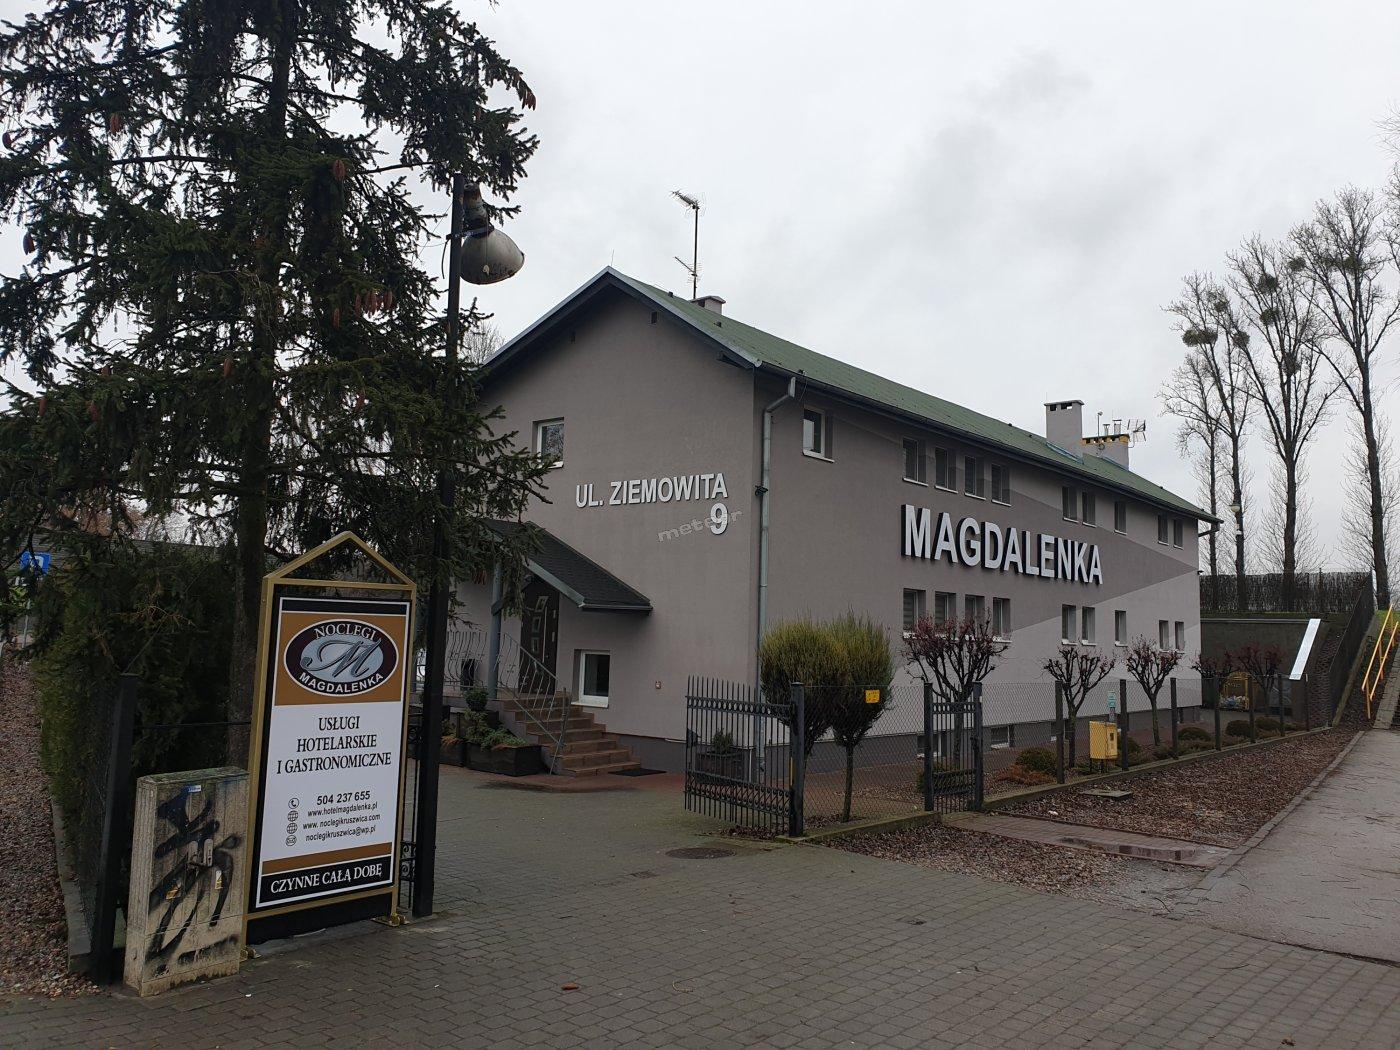 Usługi Hotelarskie i Gastronomiczne  Magdalenka